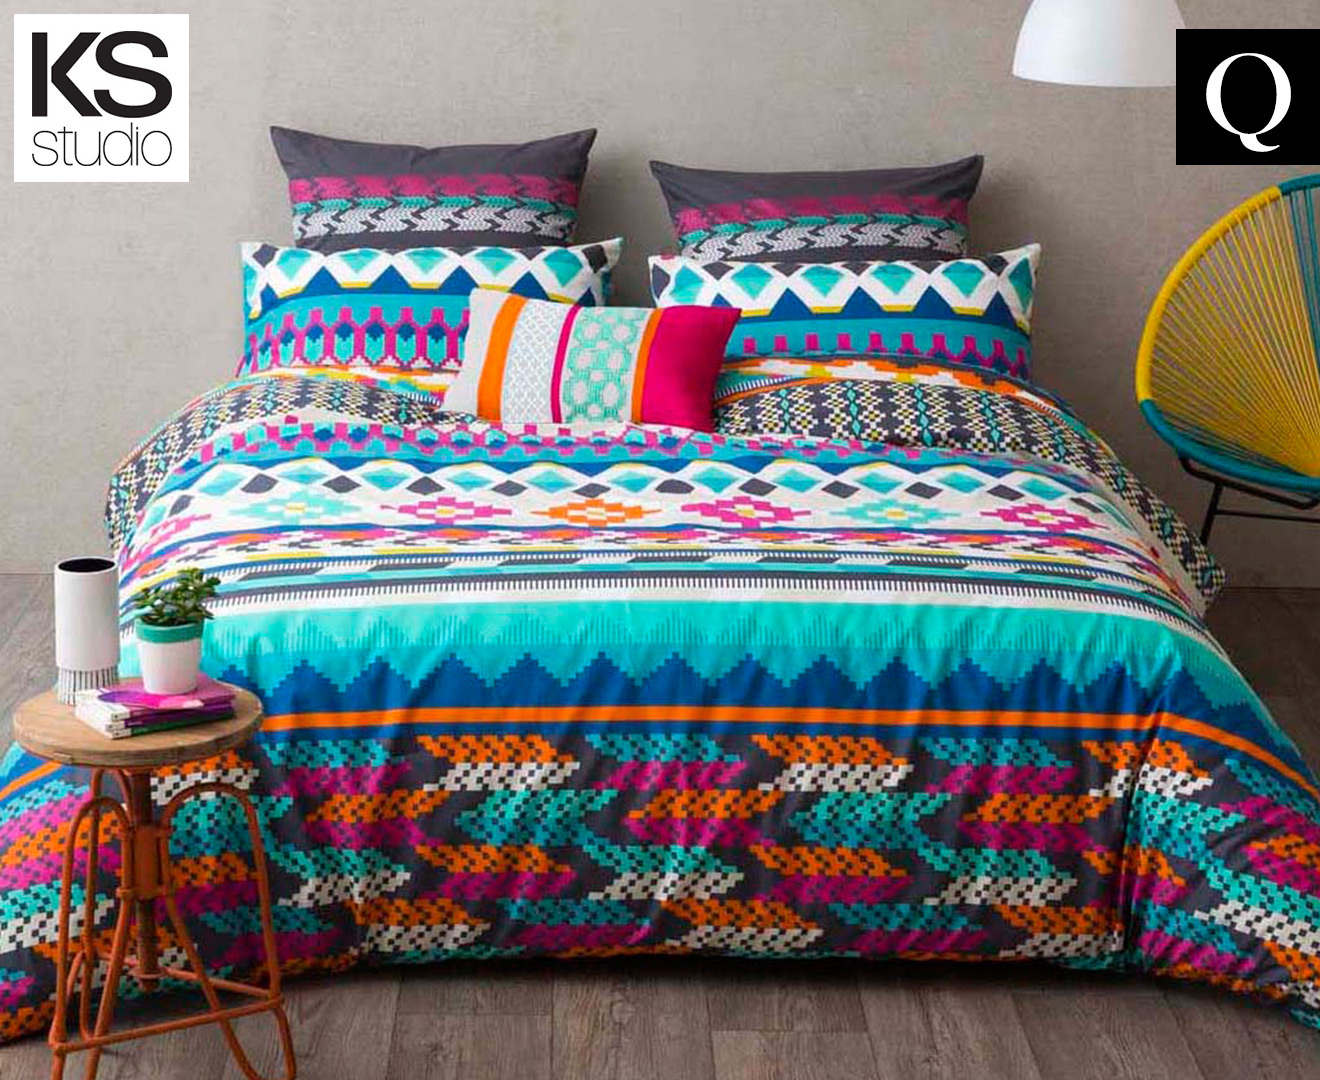 Ks studio qualia reversible queen bed quilt cover set for Studio one bed cover